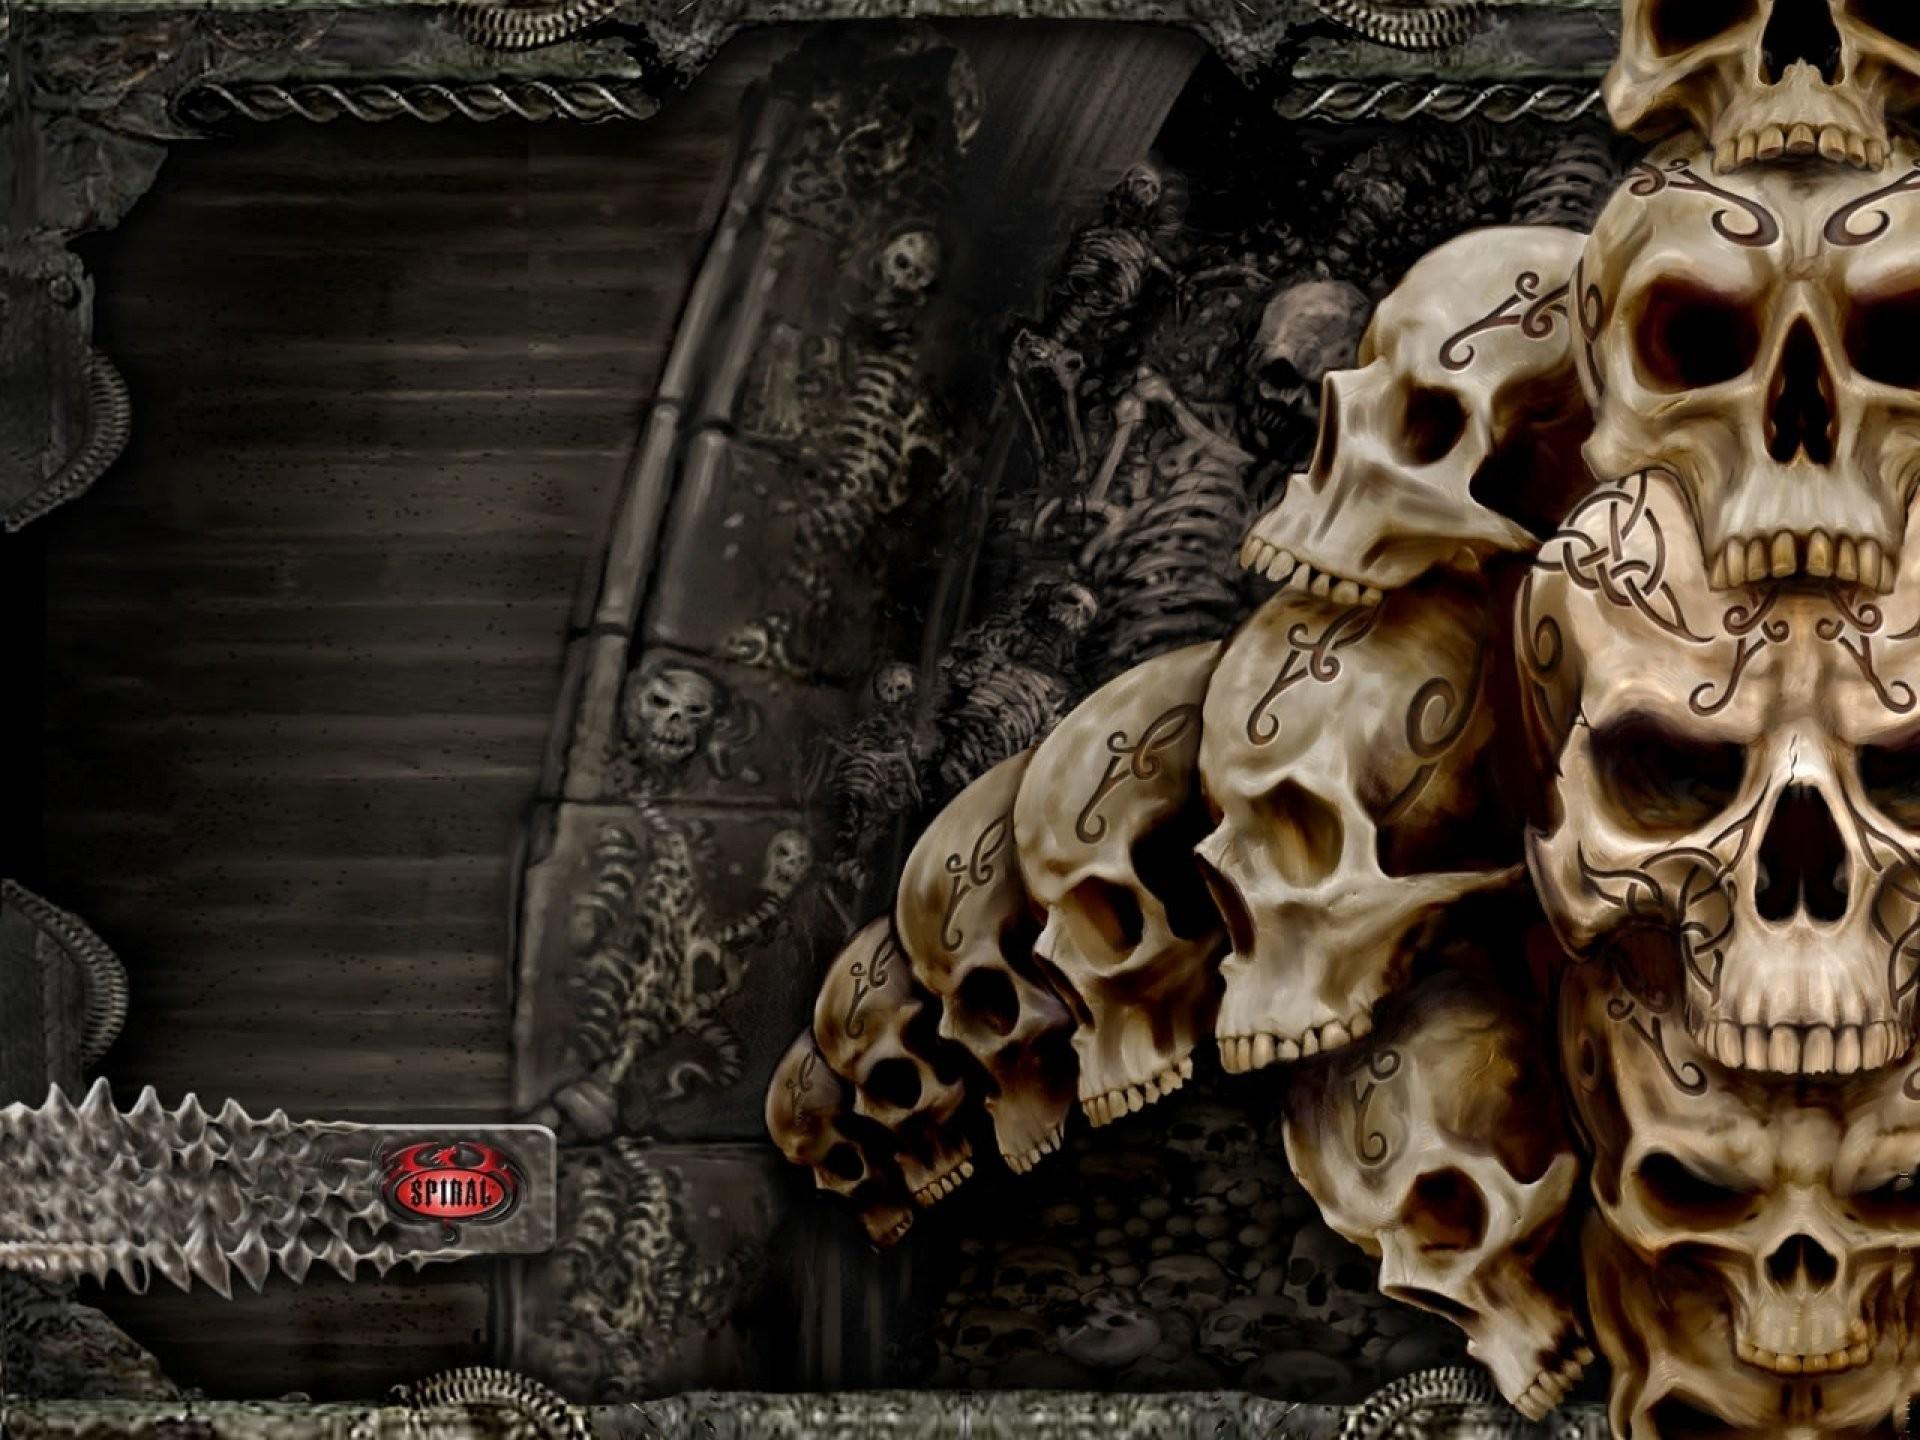 Dark Skull Evil Horror Skulls Art Artwork Skeleton D Wallpaper At Dark  Wallpapers